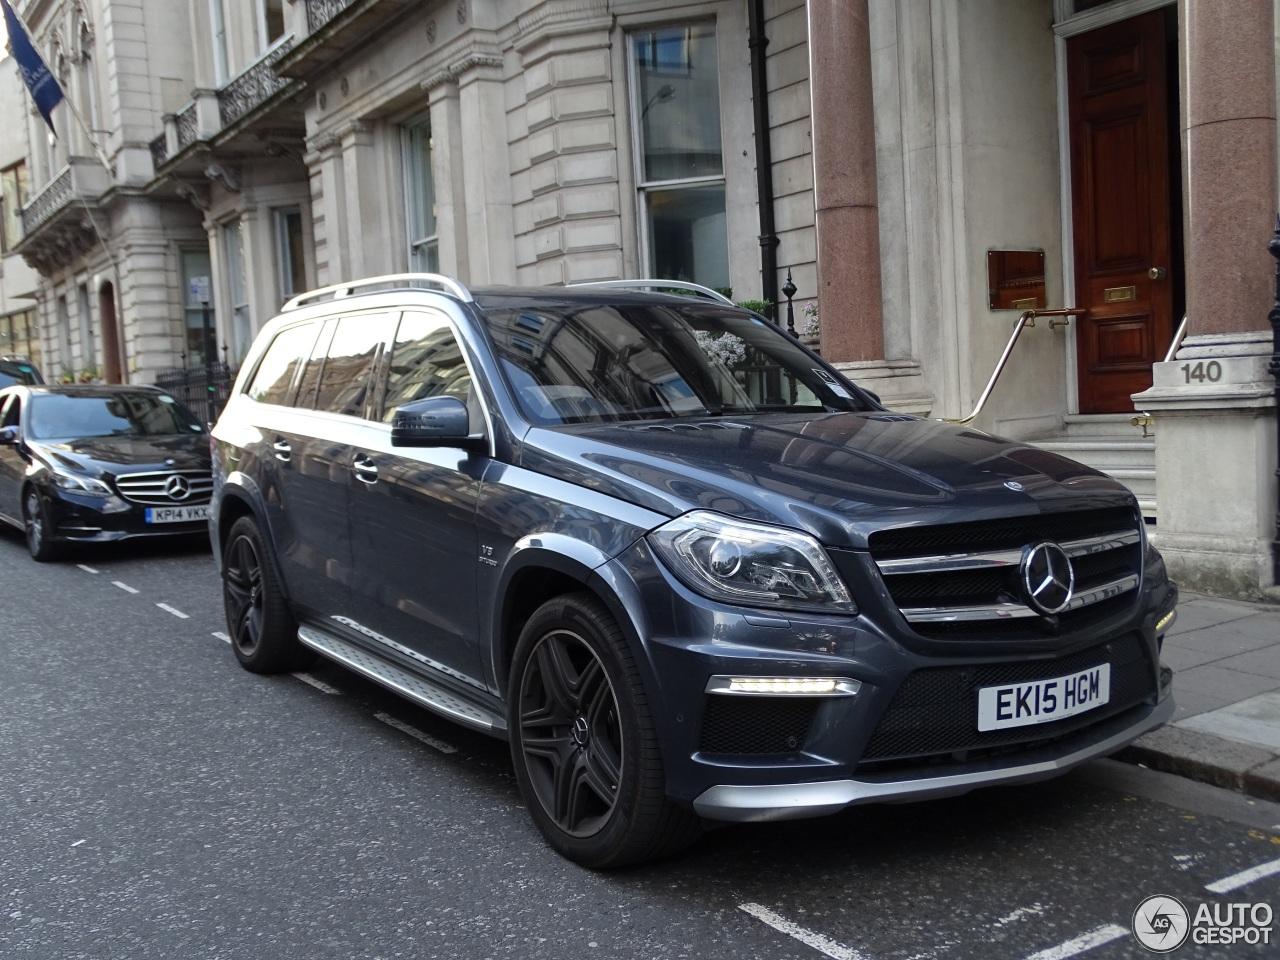 Mercedes benz gl 63 amg x166 10 july 2015 autogespot for Mercedes benz gl amg 2015